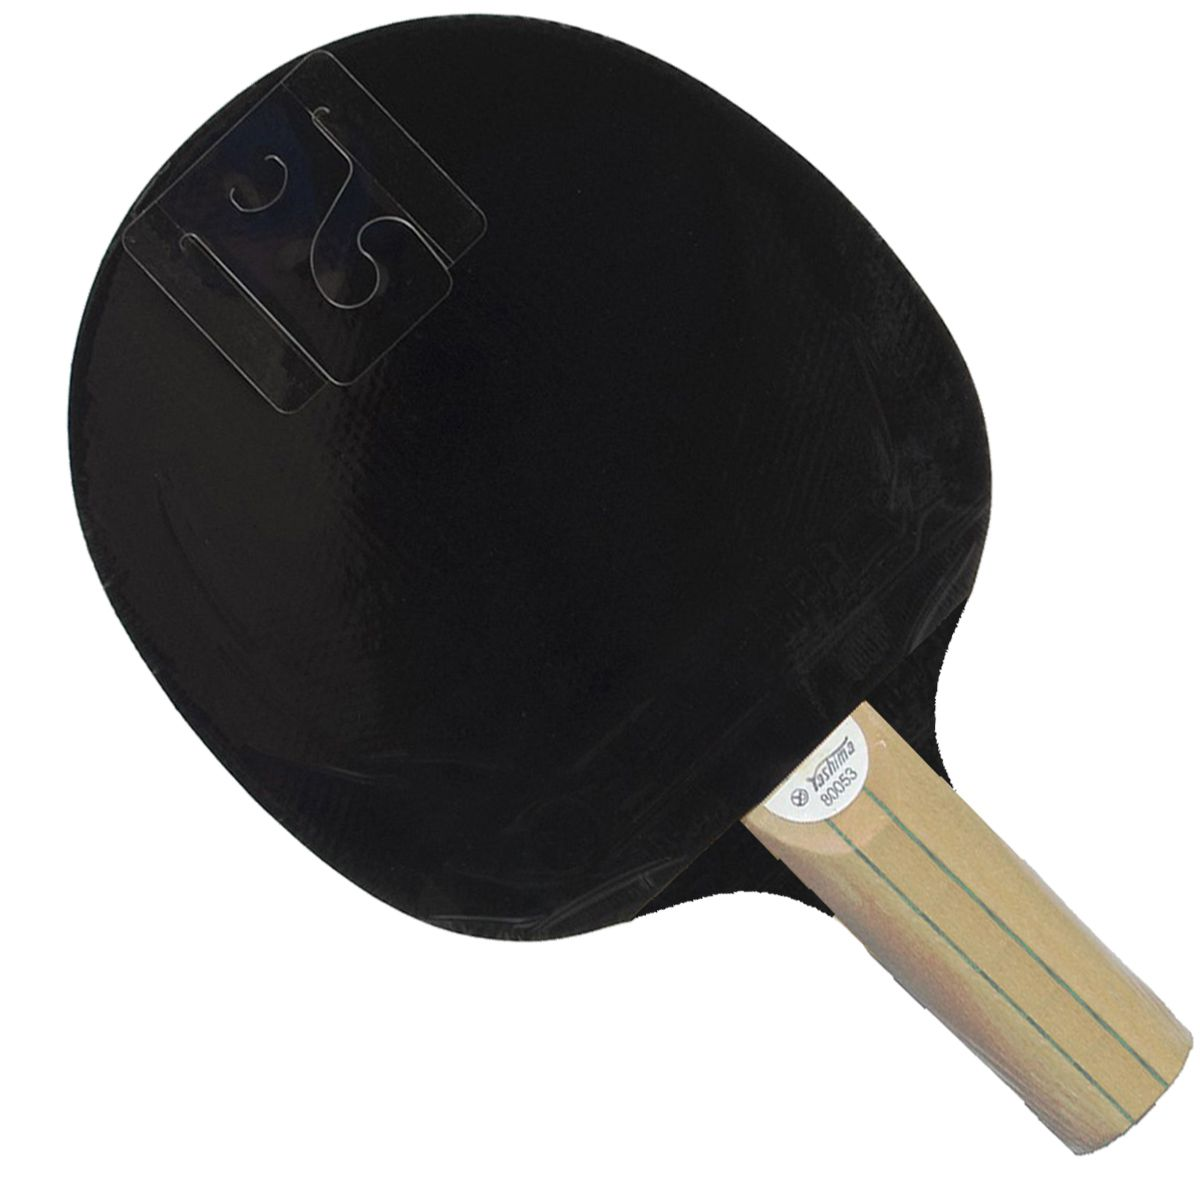 Raquete Tenis de Mesa Yashima Competition Pro Series XR3000 Rubber Caneteira 80053B